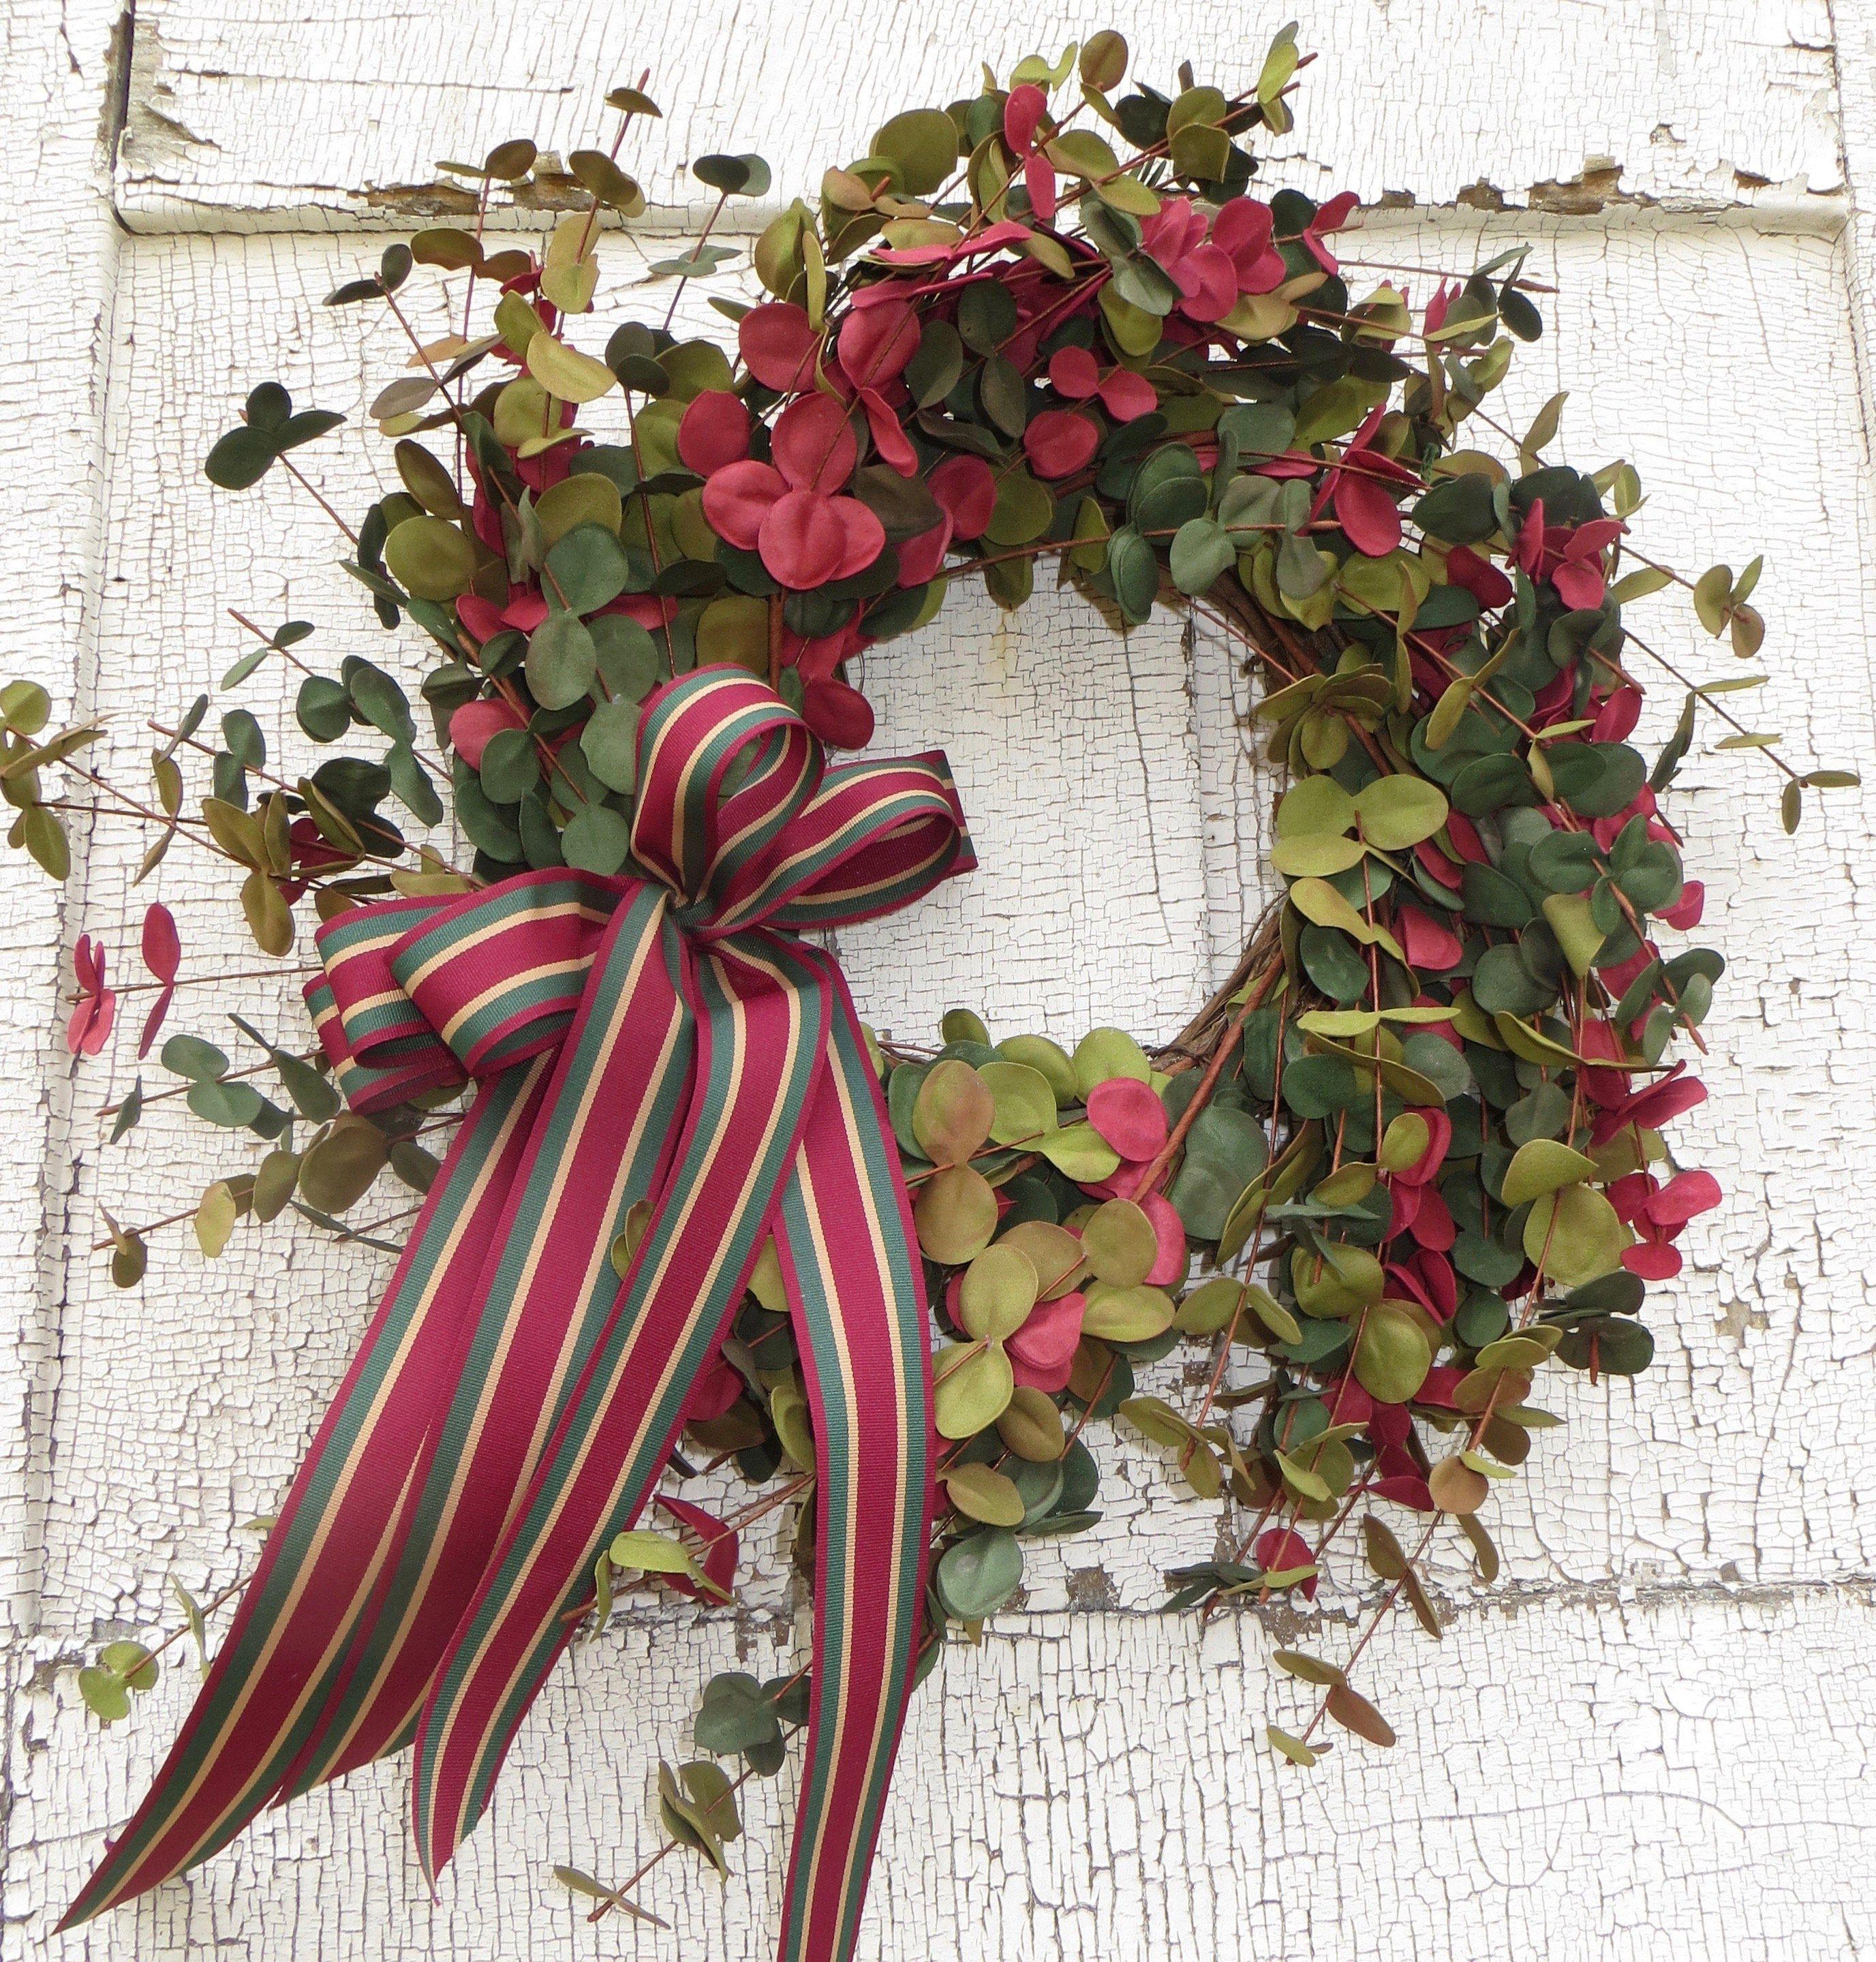 Photo of Faux Eucalyptus Wreath, Eucalyptus Wreath, Handmade Wreath, Handmade Faux Eucalyptus Wreath, Dried Flower Wreath, Wreath